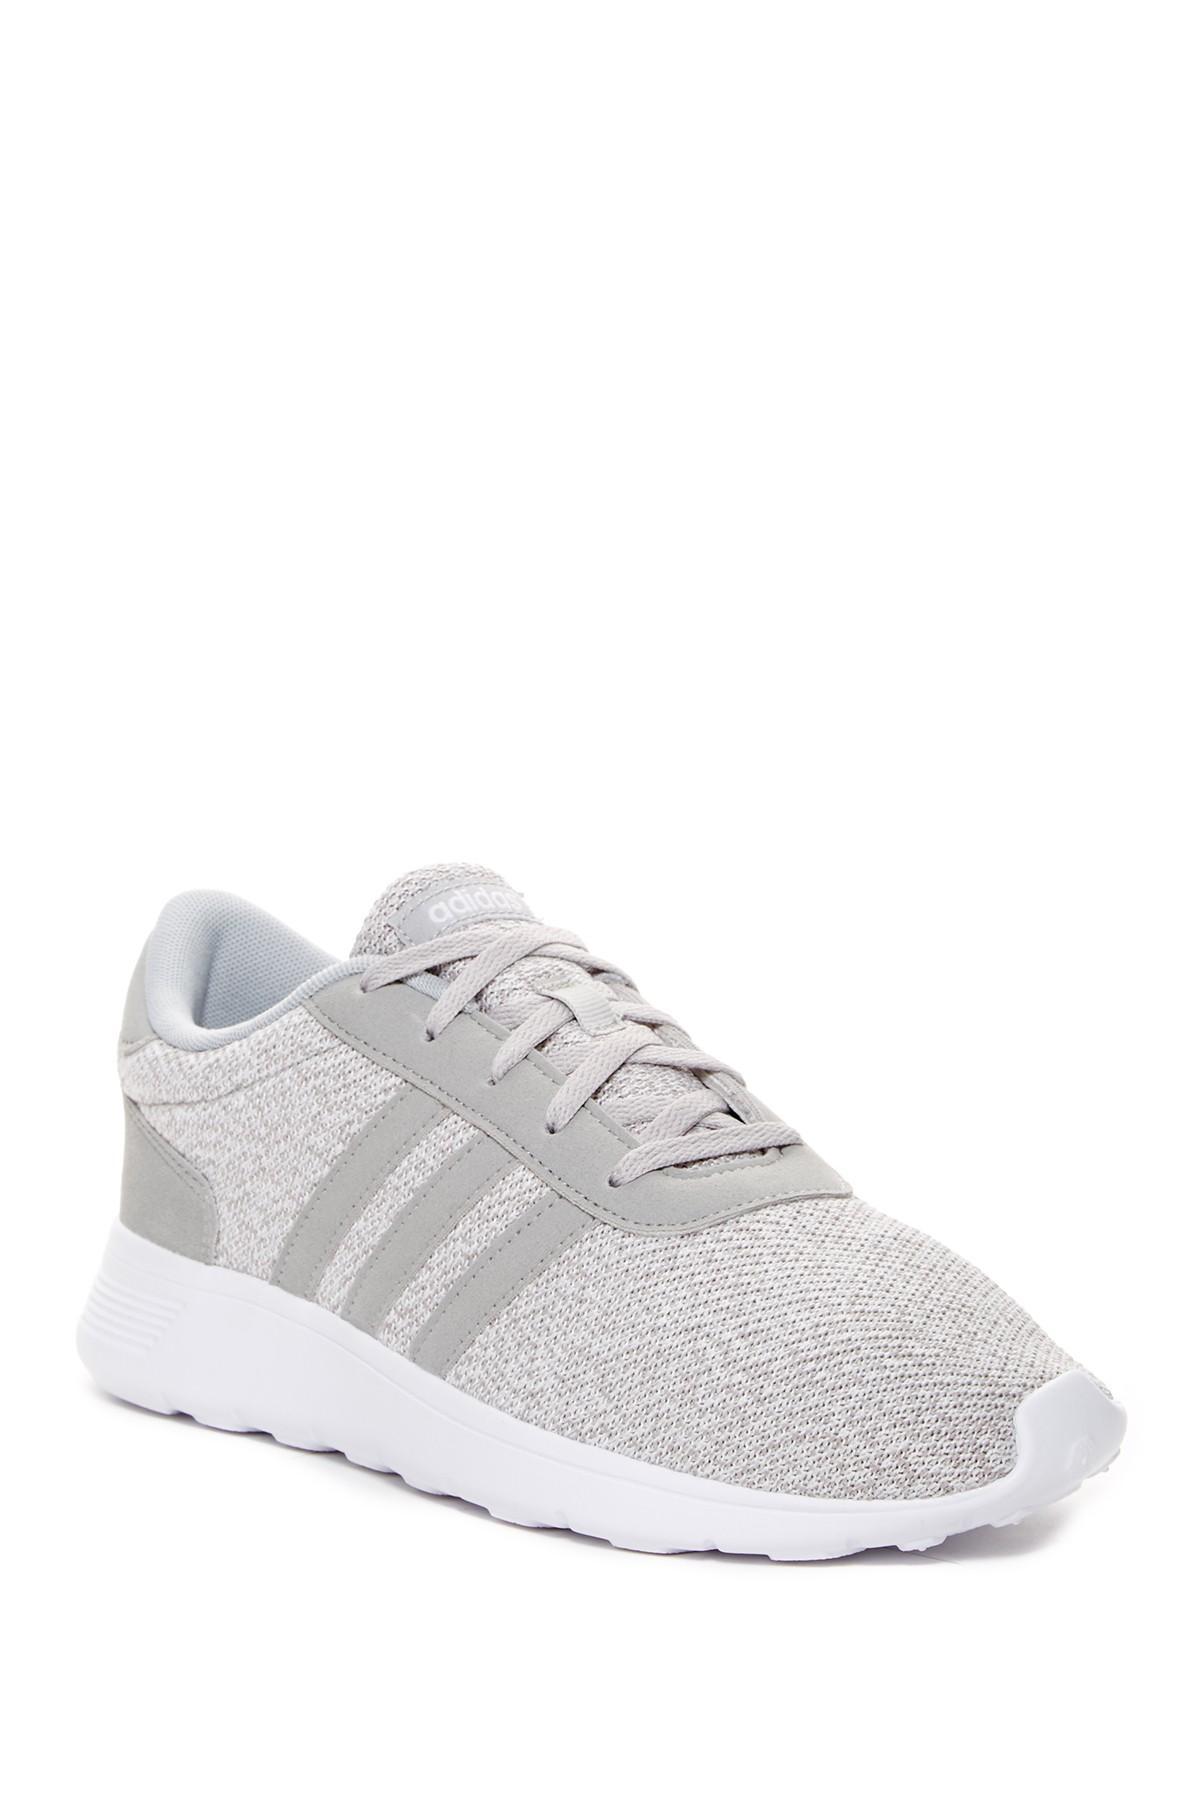 Adidas Originals Lite Racer Sneaker In White Lyst